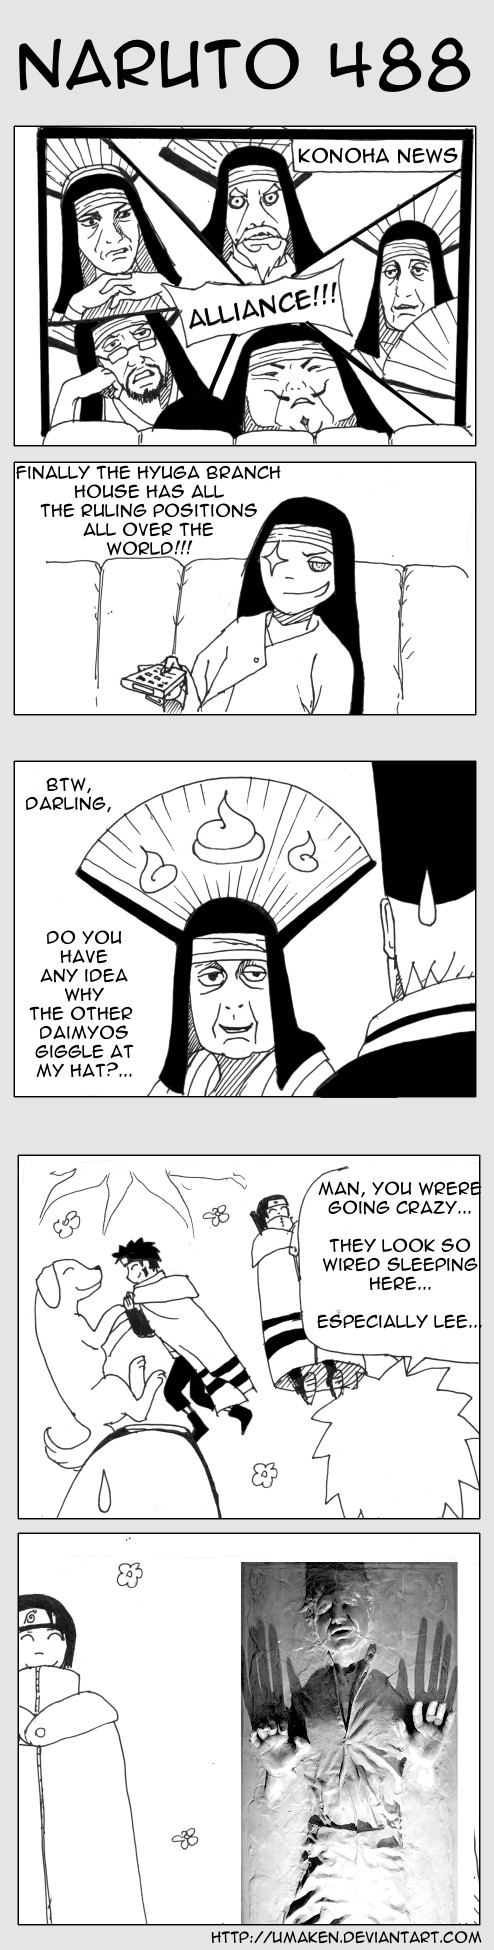 Naruto 488 by Umaken